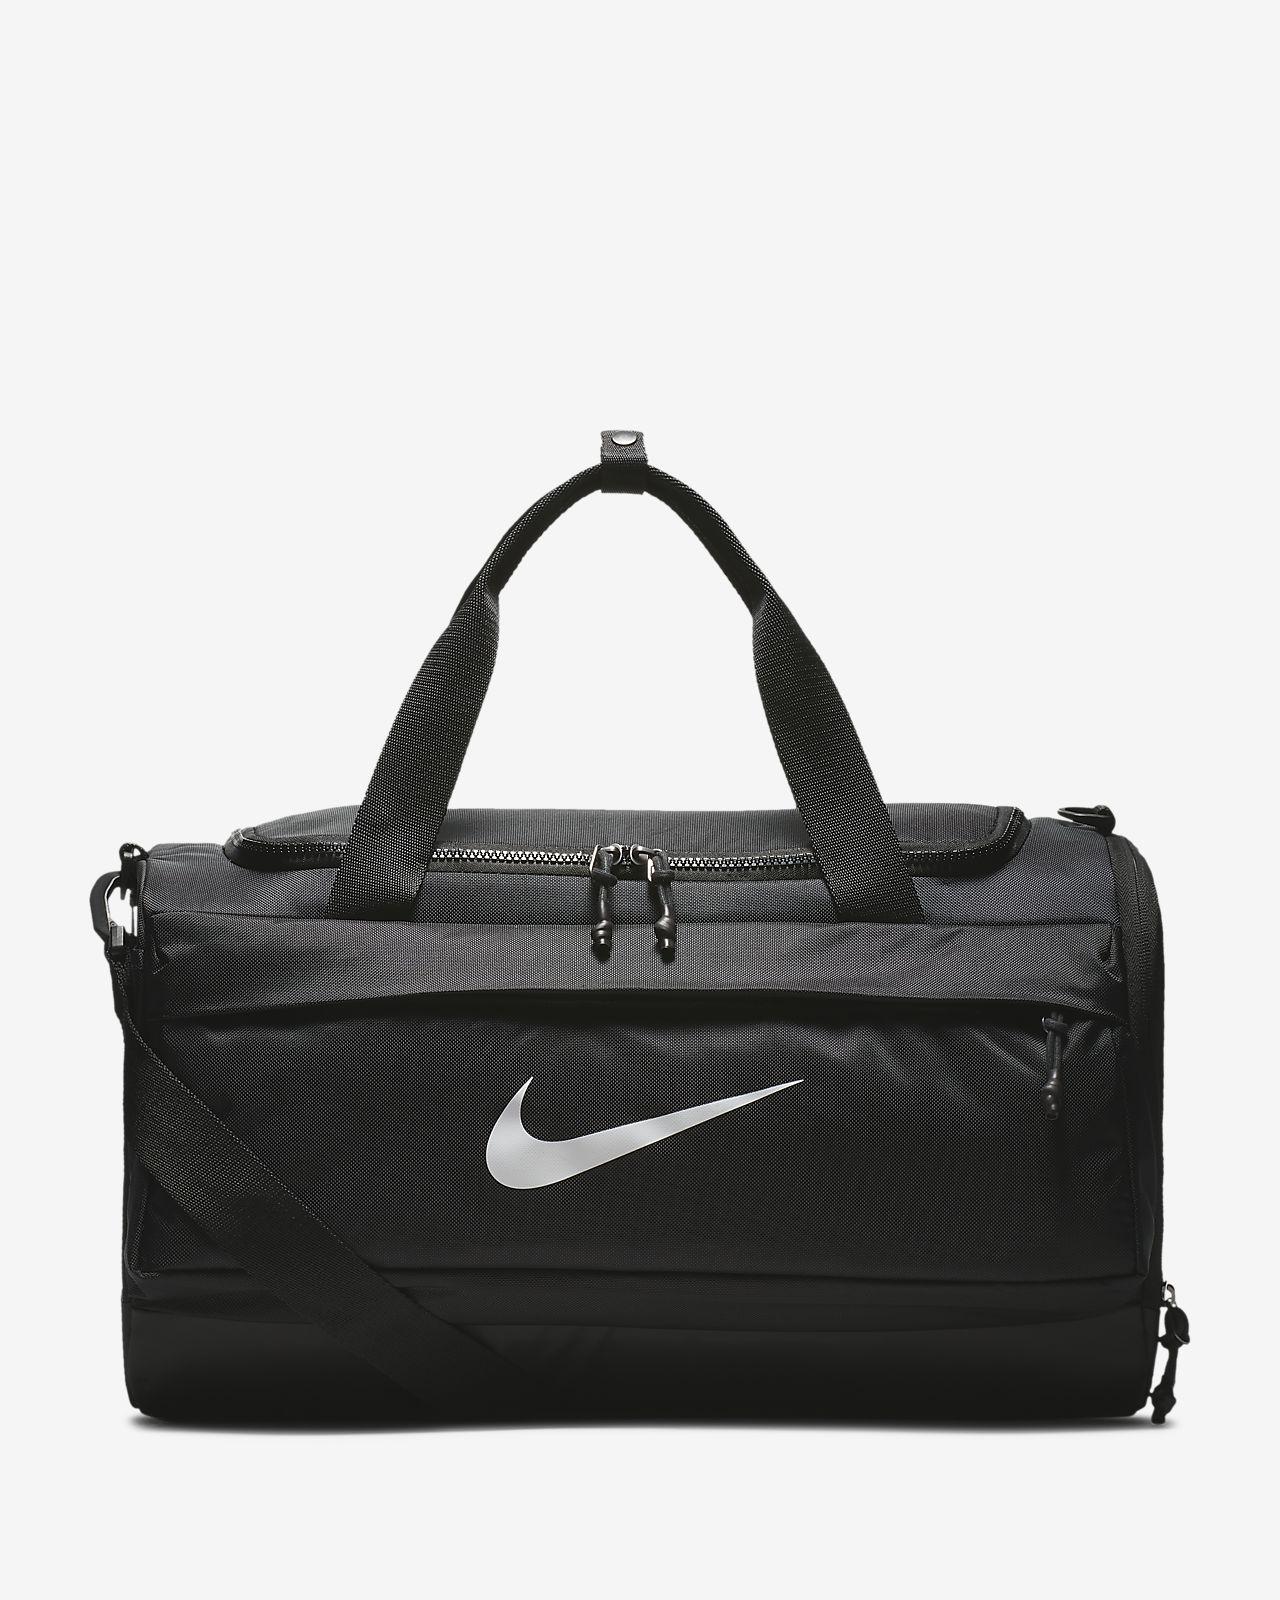 Nike Vapor Sprint Kinder-Sporttasche